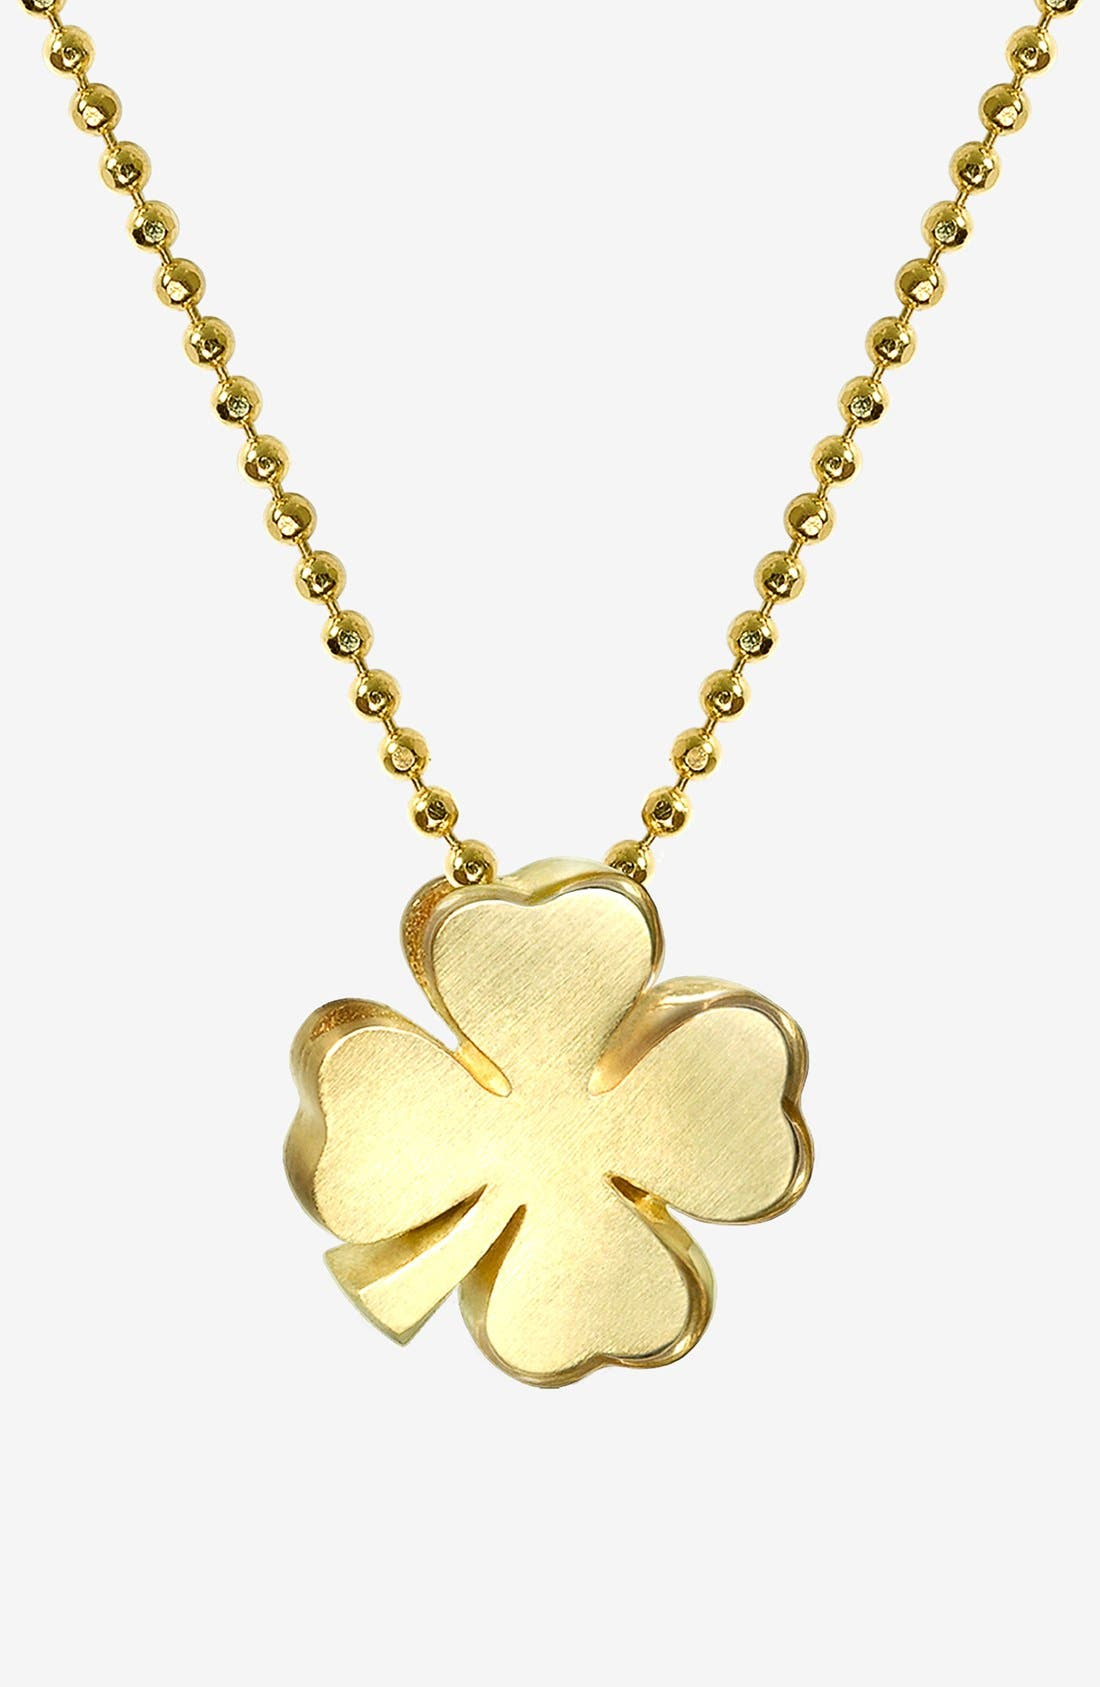 Alternate Image 1 Selected - Alex Woo 'Little Luck' Clover Pendant Necklace